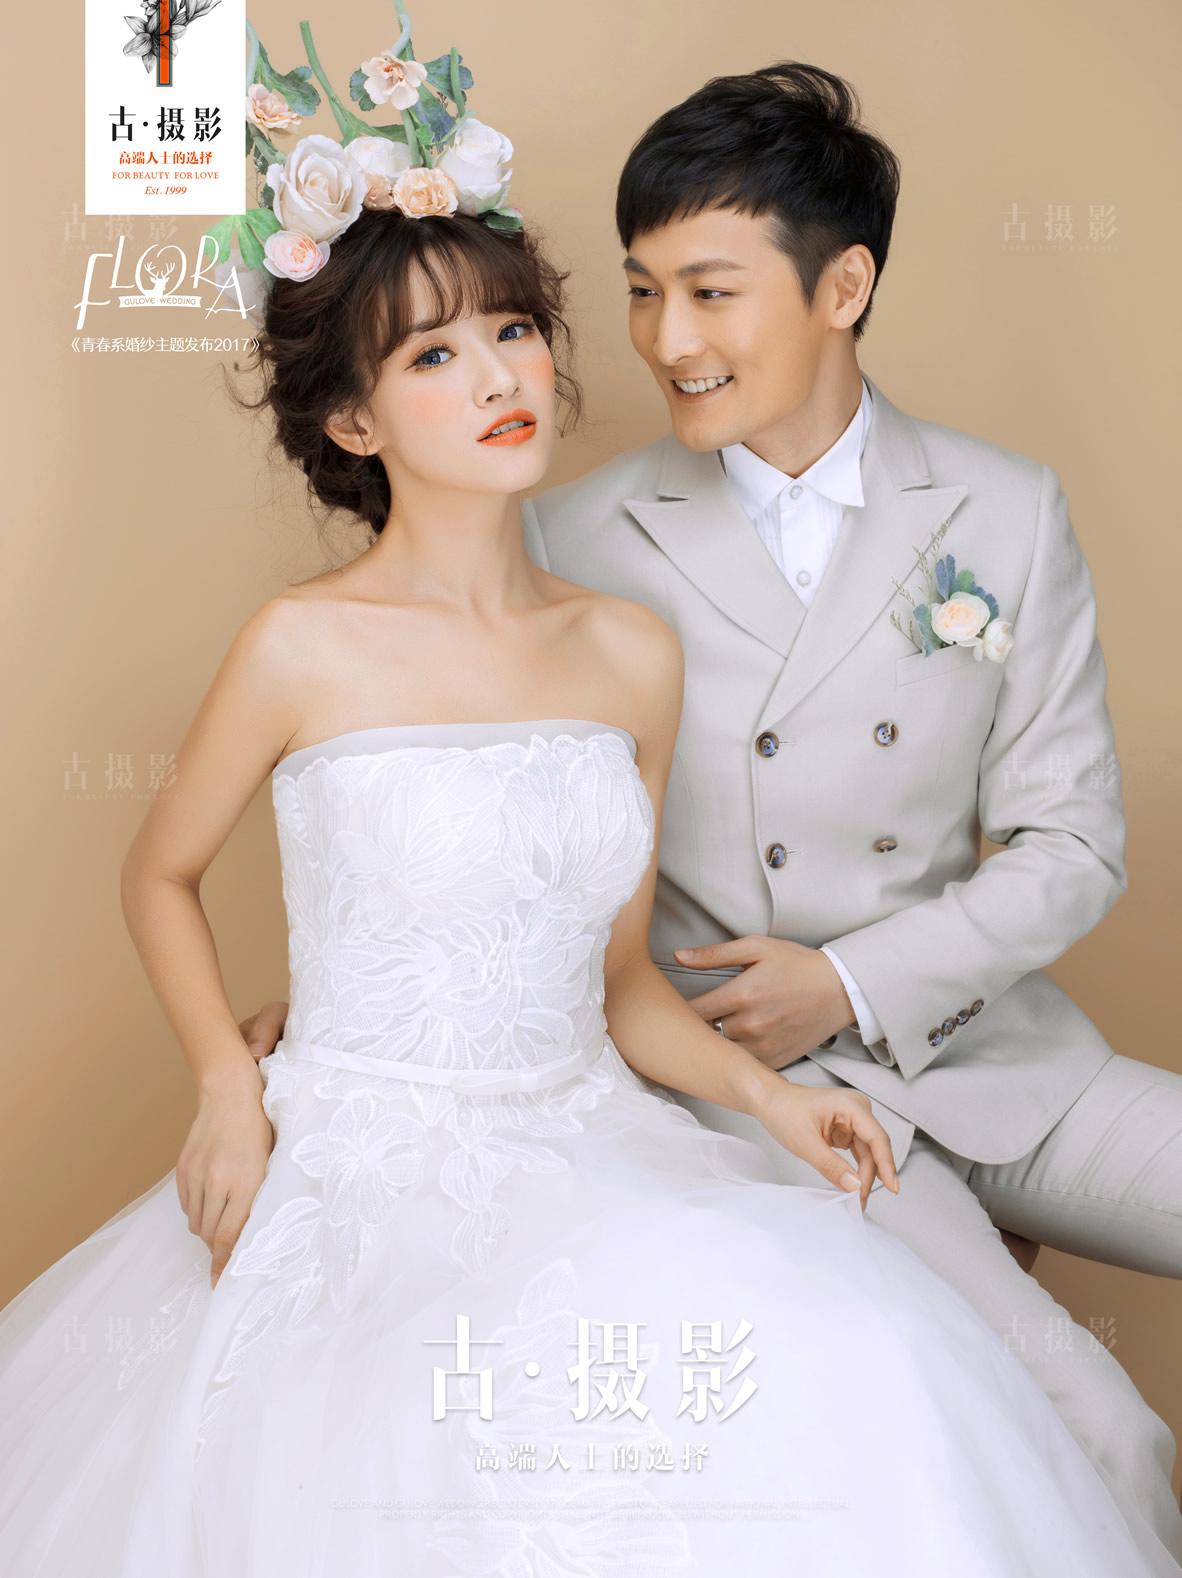 flowers Ⅲ - 明星范 - 古摄影婚纱艺术-古摄影成都婚纱摄影艺术摄影网